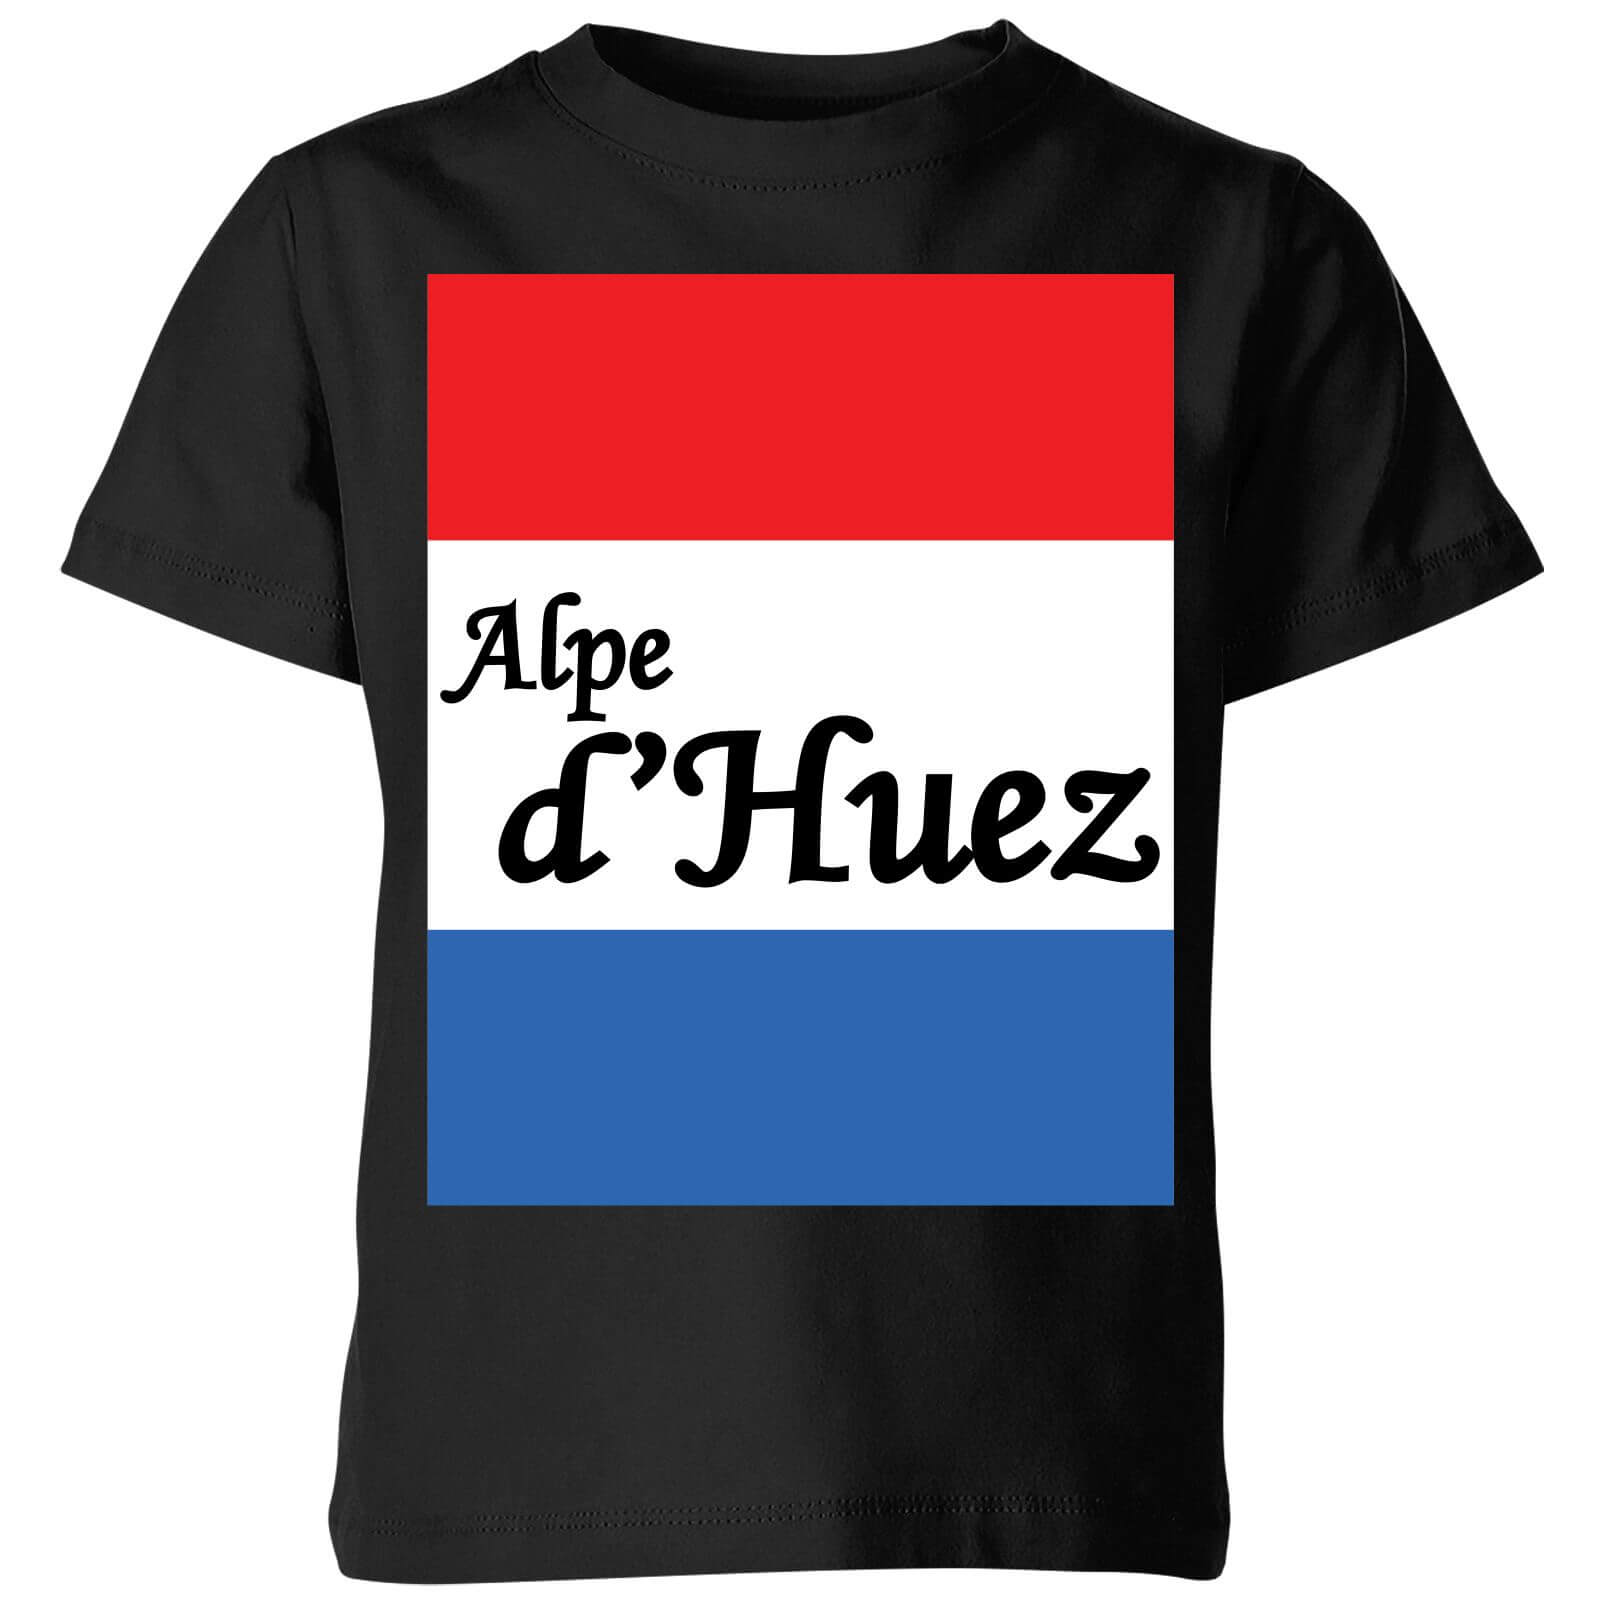 Summit Finish Alpe Dhuez Kids T-shirt - Black - 9-10 Years - Black